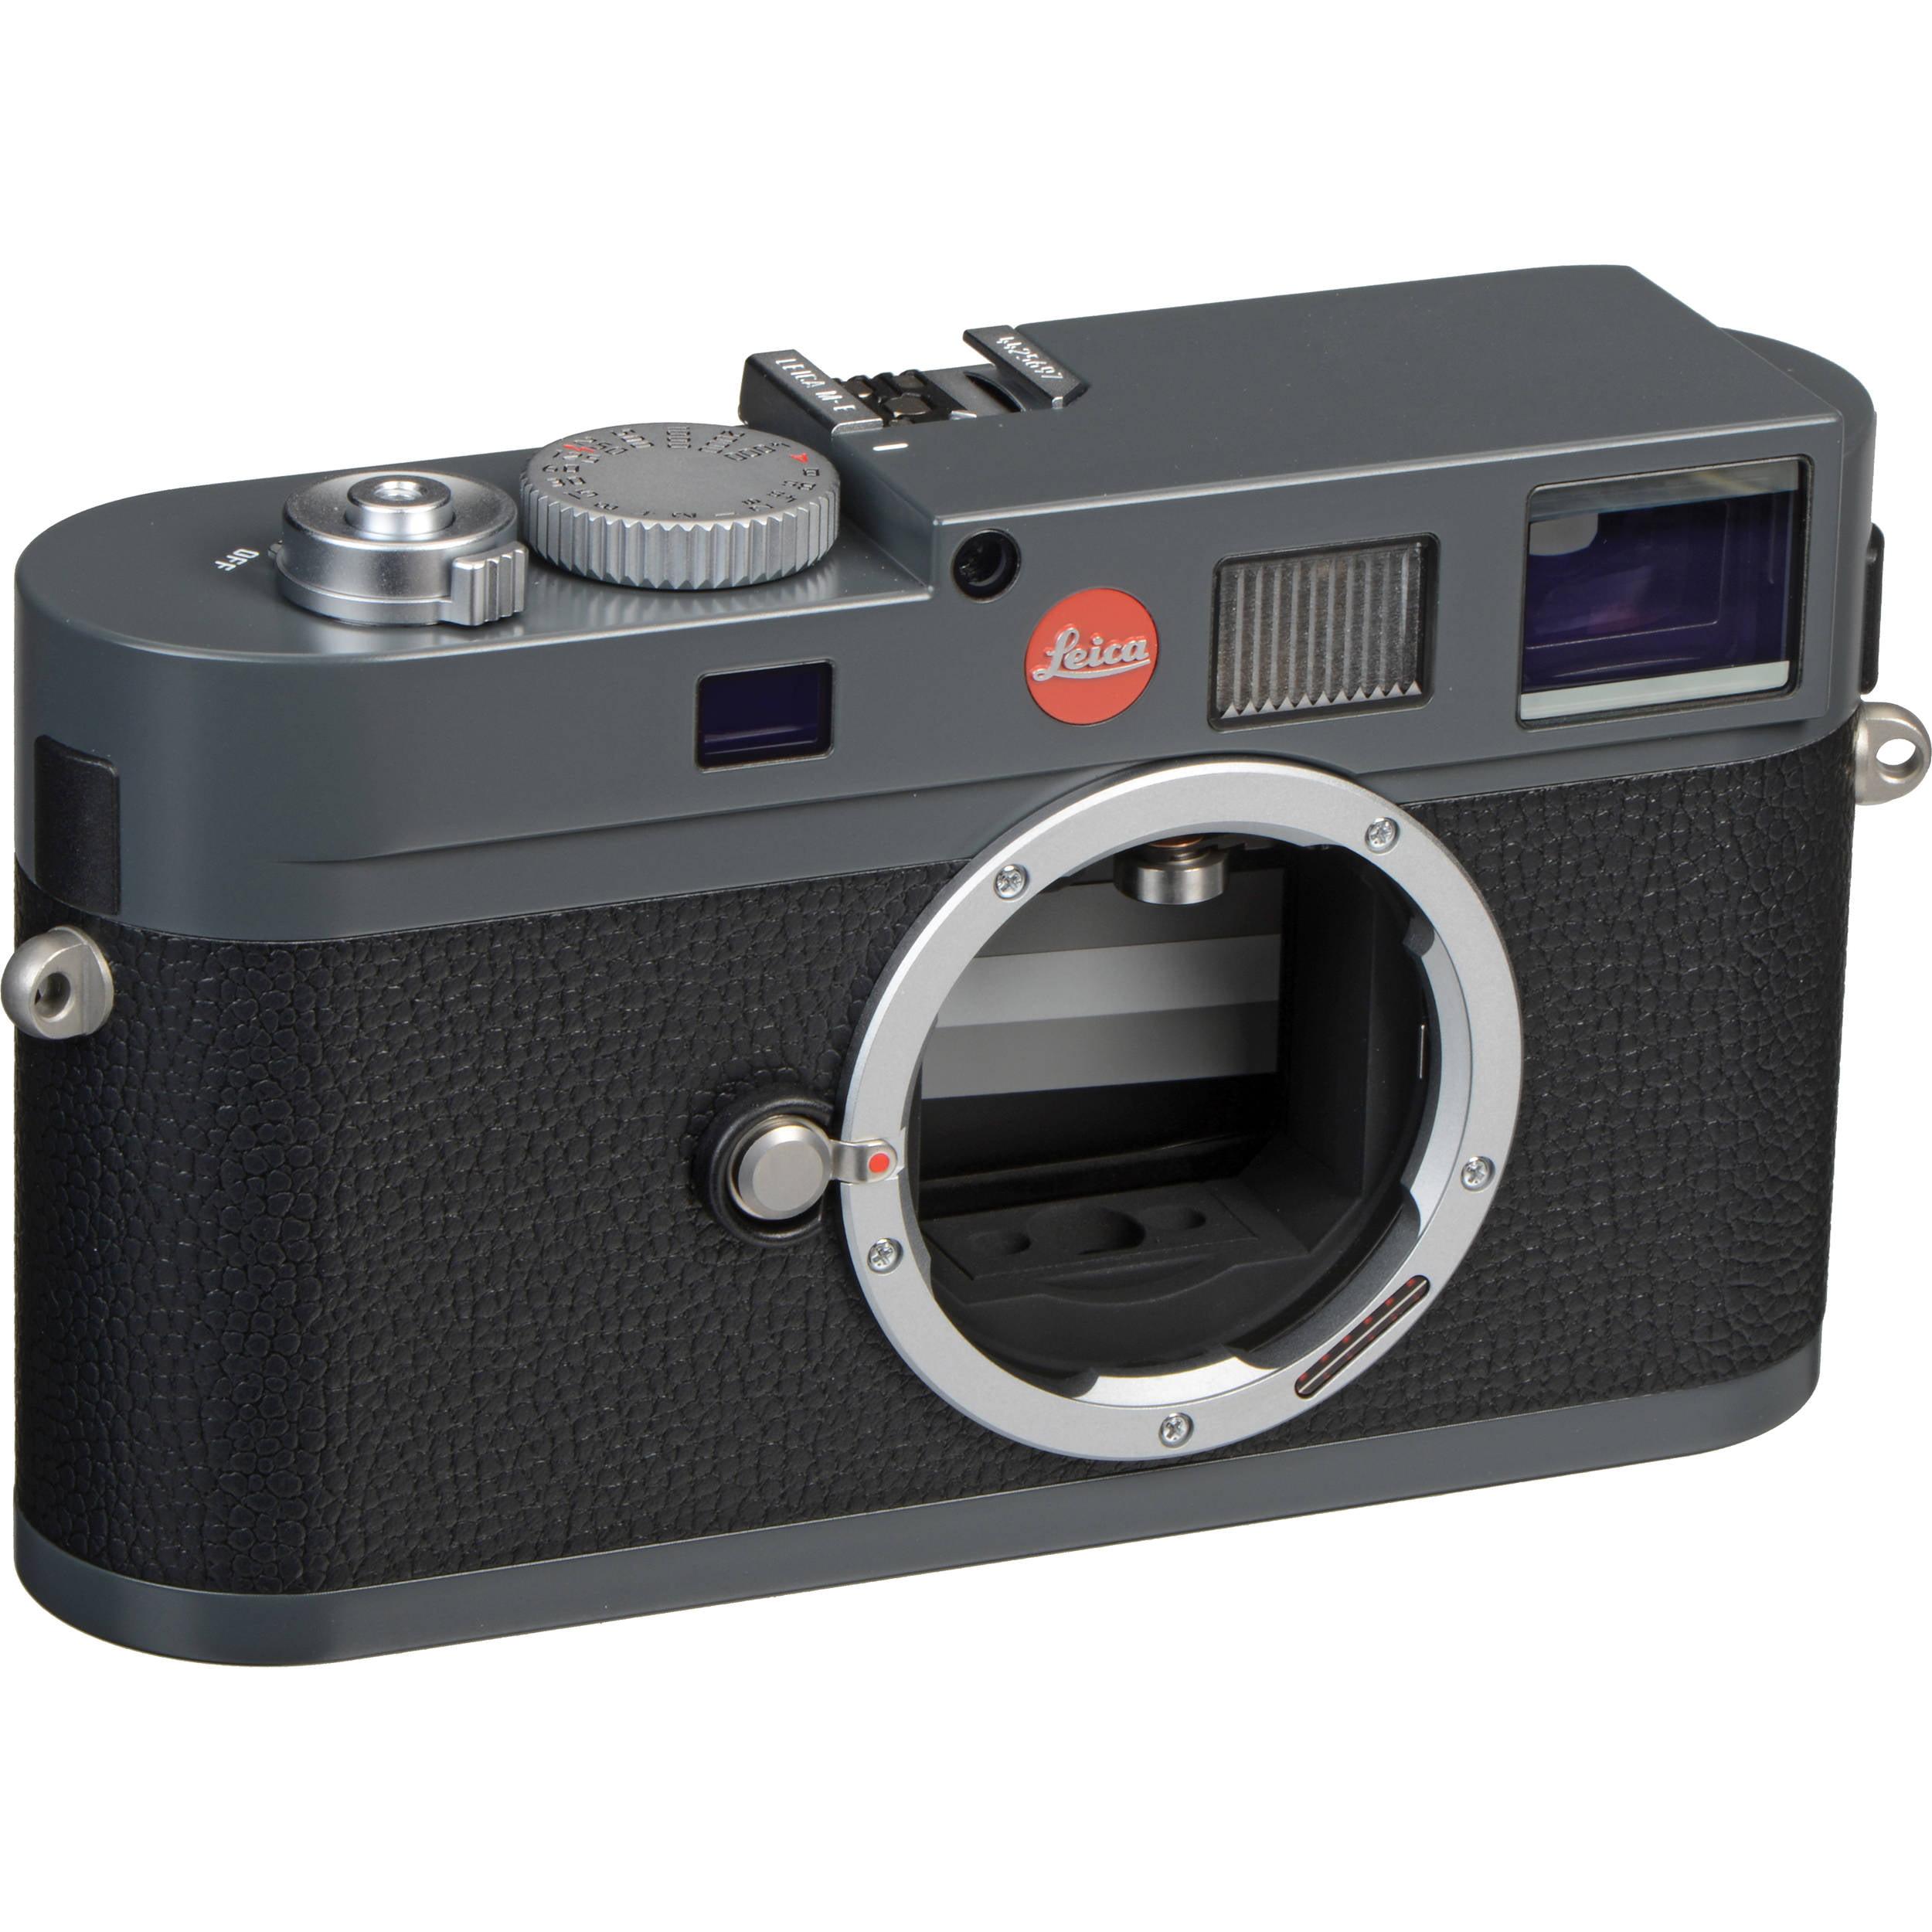 Leica M-E Digital Rangefinder Camera by Leica